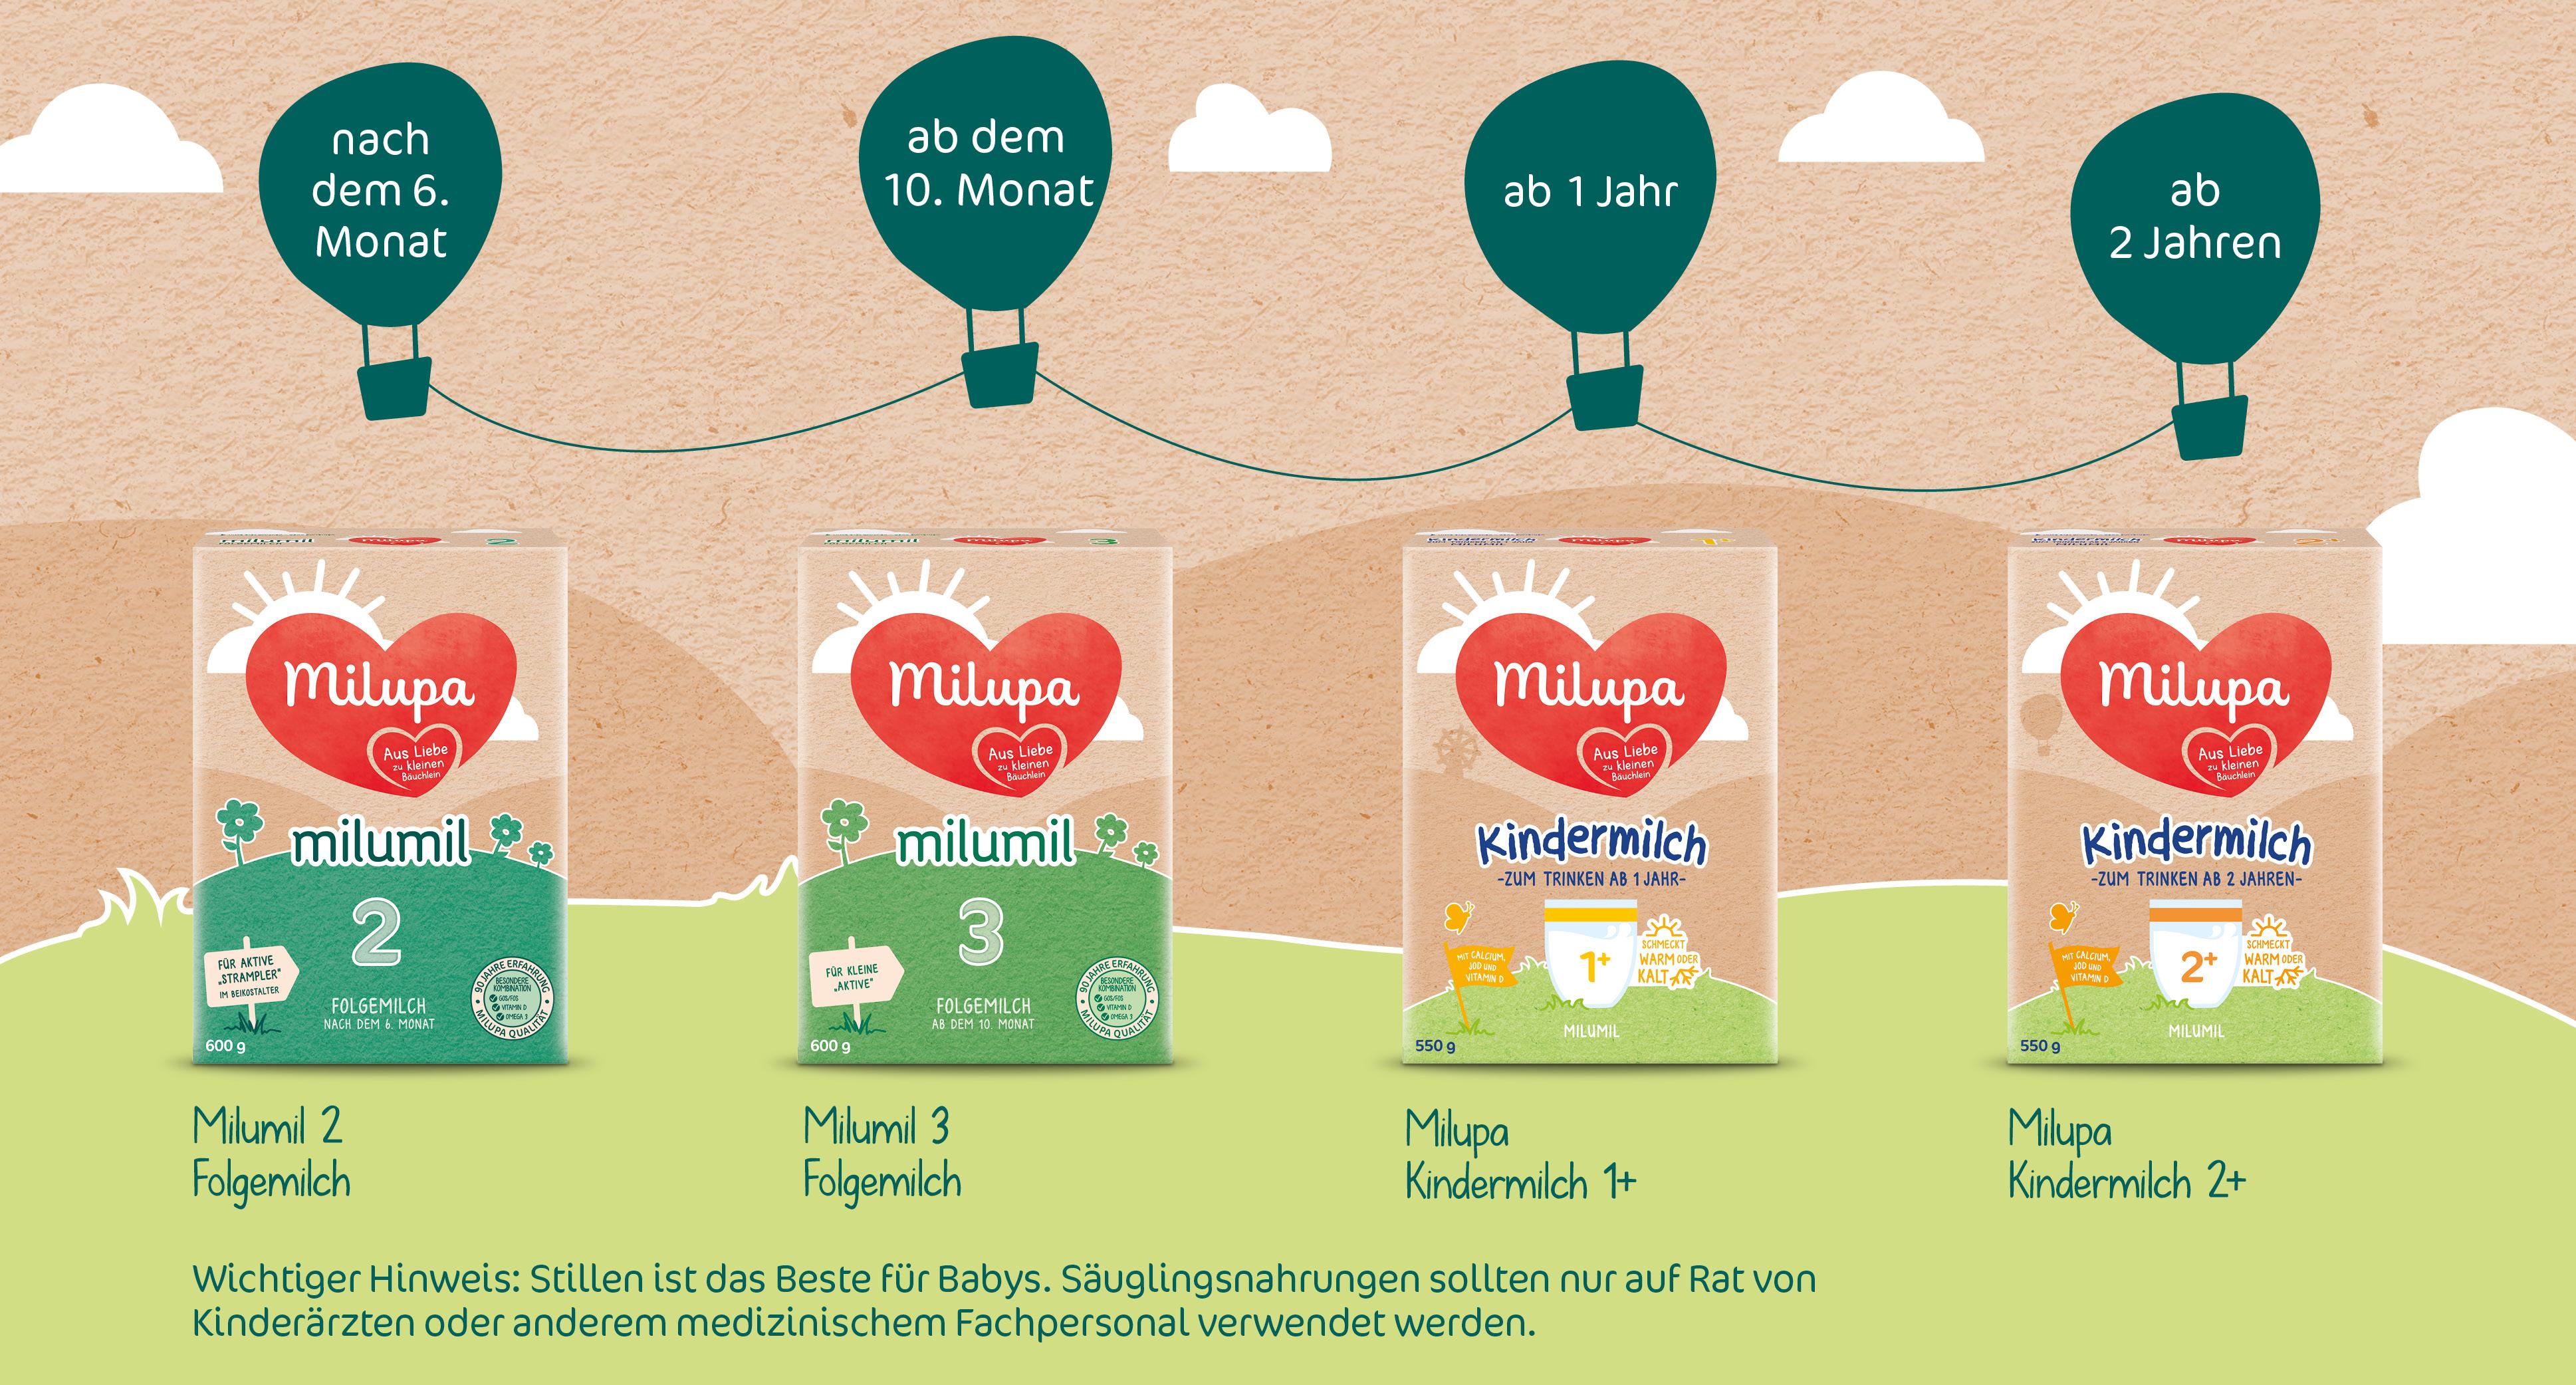 Milupa Folgemilch Milumil 3 5 x 600 g ab dem 10. Monat - babymarkt.de